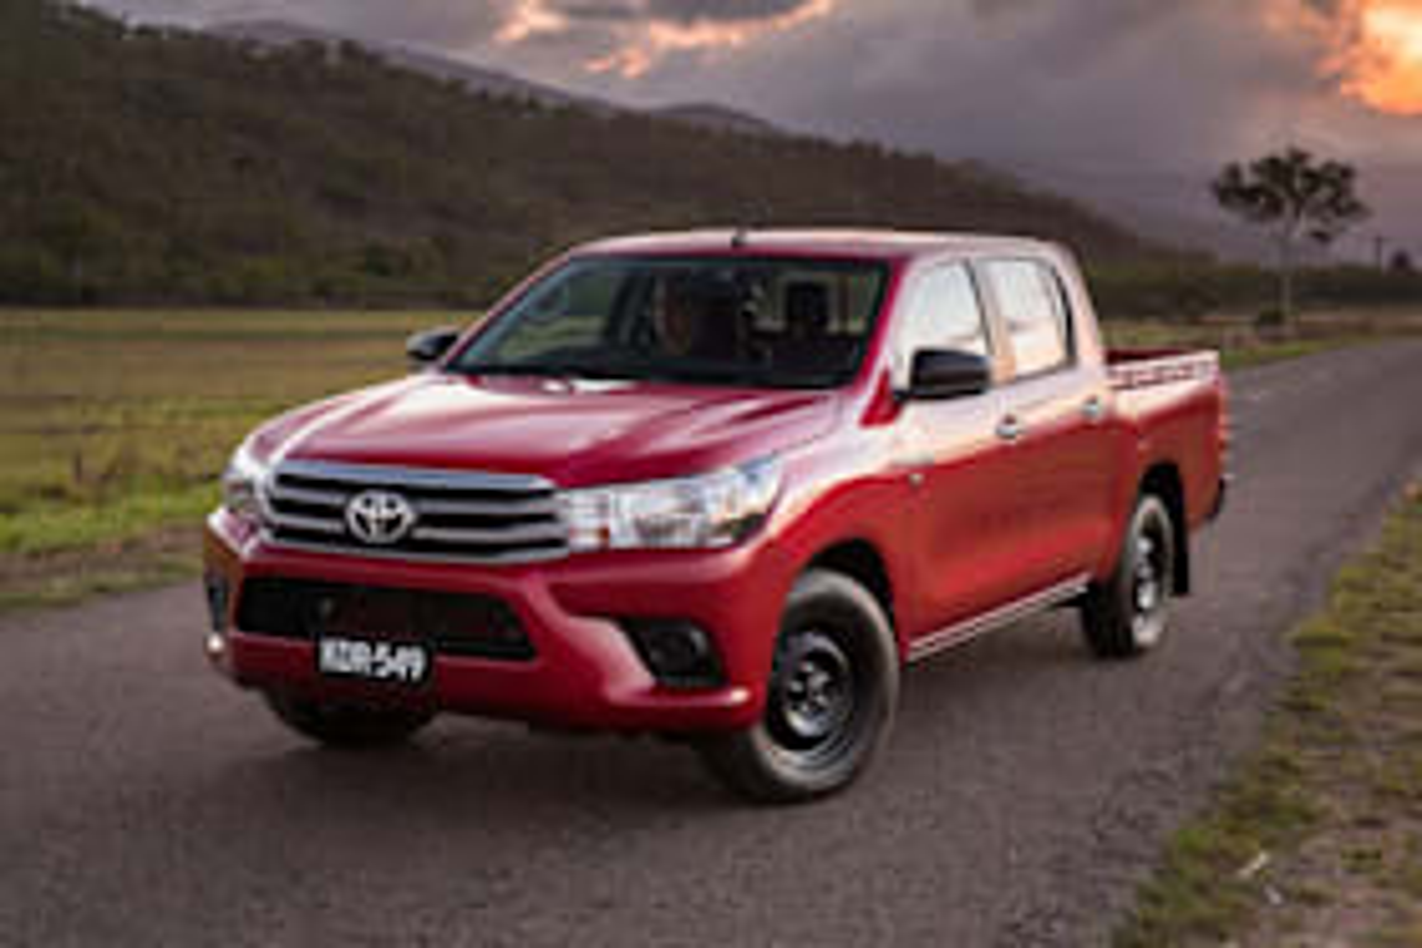 2017 Toyota Hilux - australia's top selling vehicle